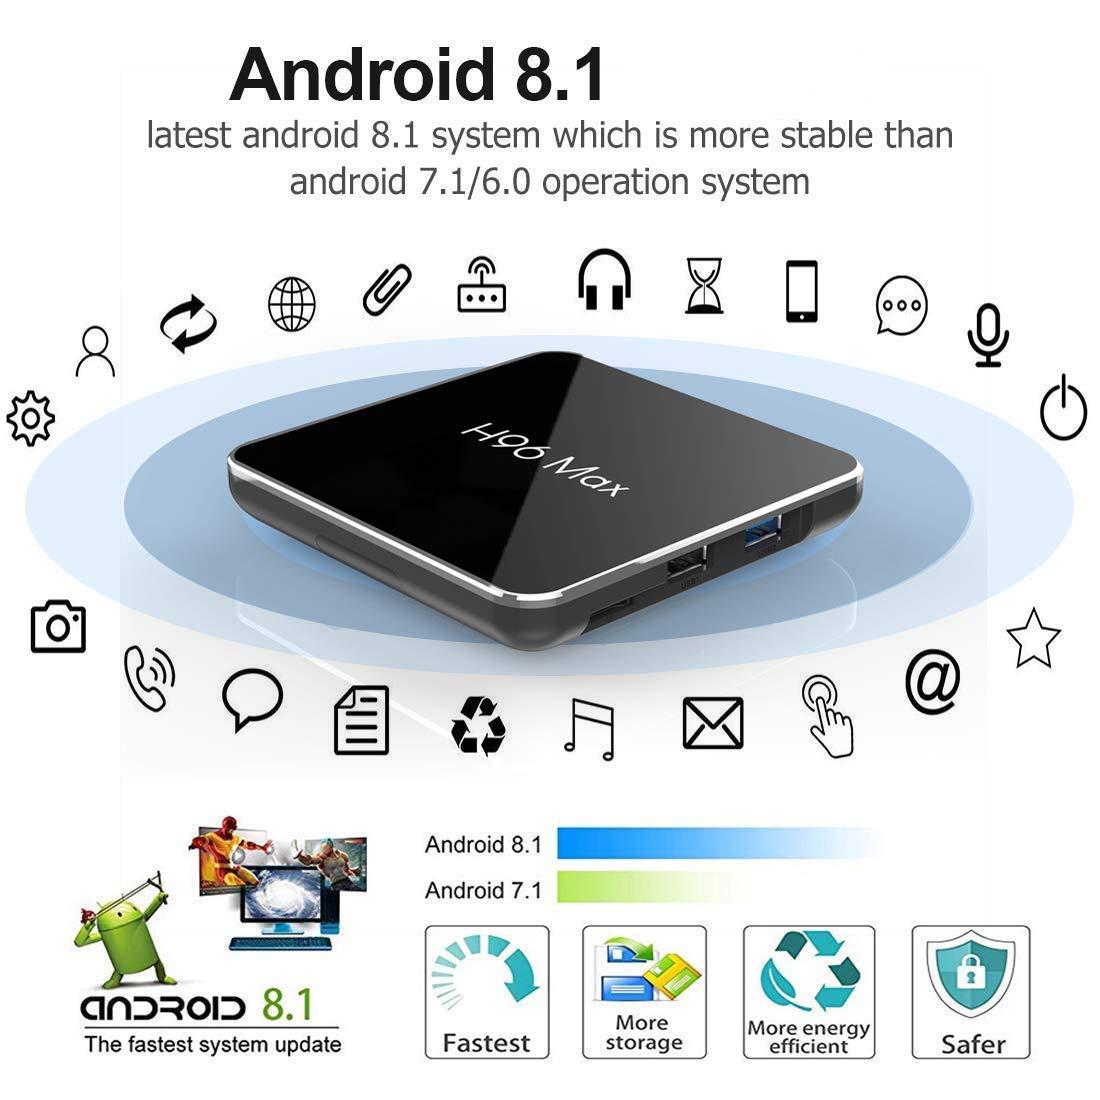 Android 8 1 TV Box H96 Max X2 4GB DDR4 Ram 32GB ROM EstgoSZ Smart 4K TV Box  Amlogic S905X2 Support HDMI 2 1 H265 VP9 Video Decoding Dual WiFi 2 4G